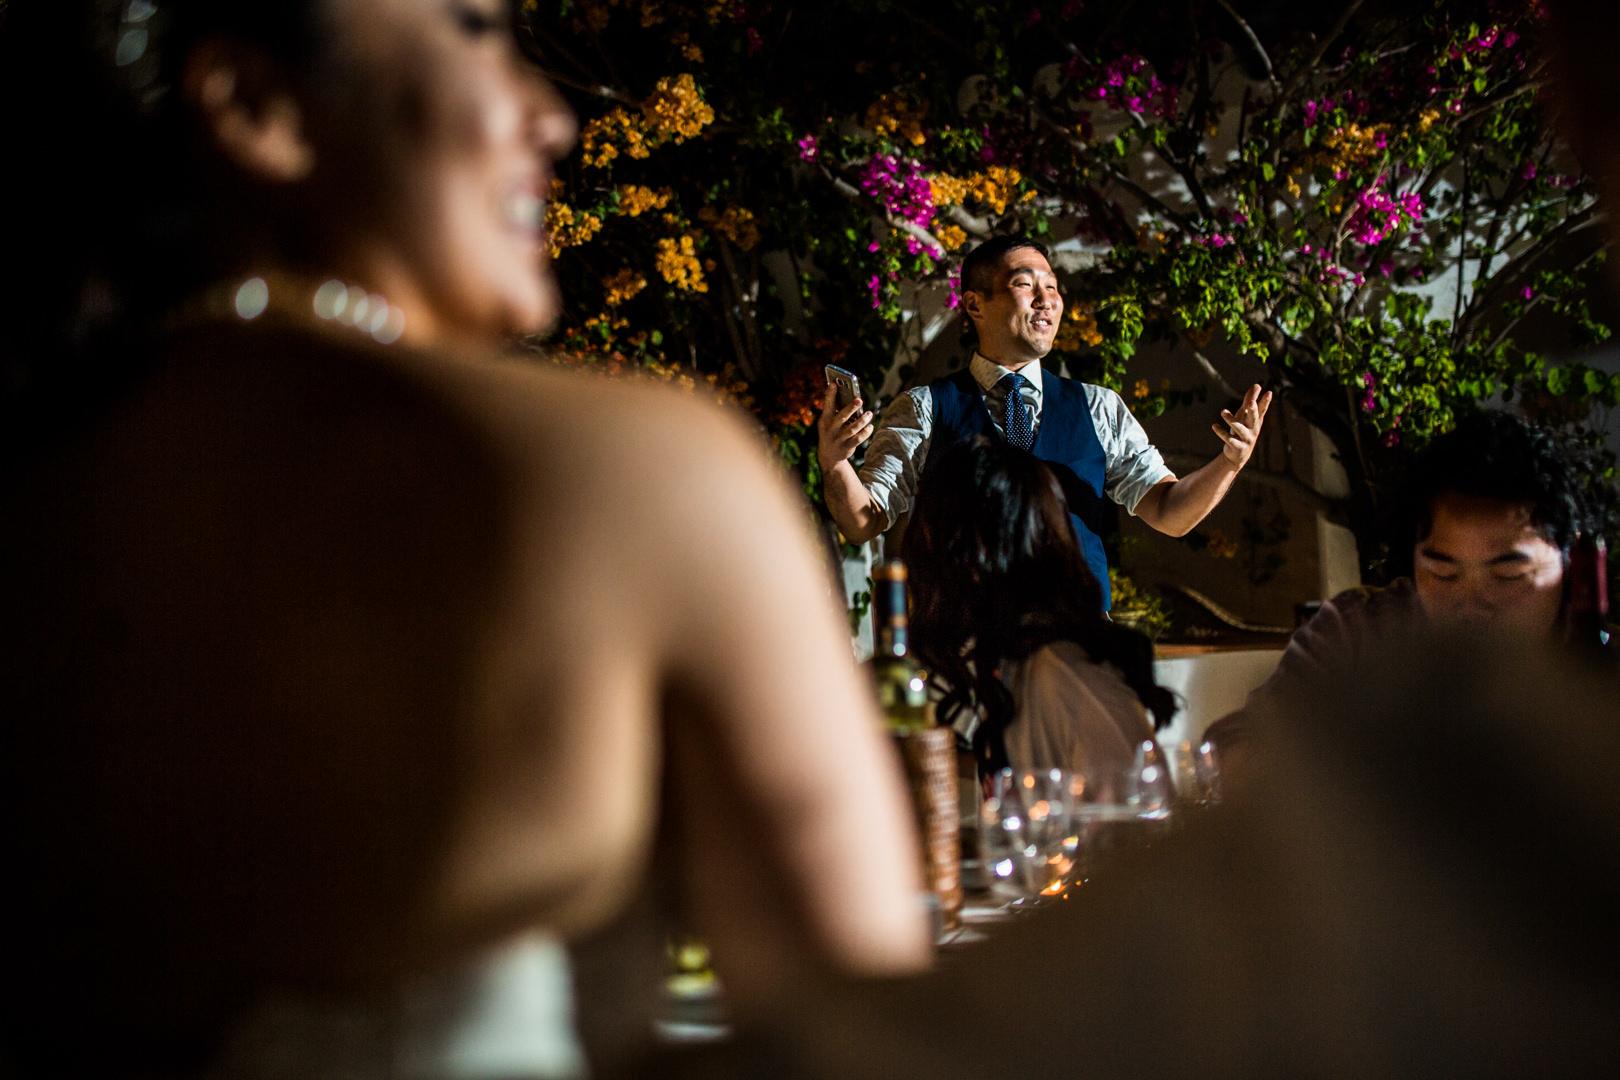 Boda-Hacienda-San-Rafael-Sevilla-engagement-Rafael-Torres-fotografo-bodas-sevilla-madrid-barcelona-wedding-photographer--71.jpg